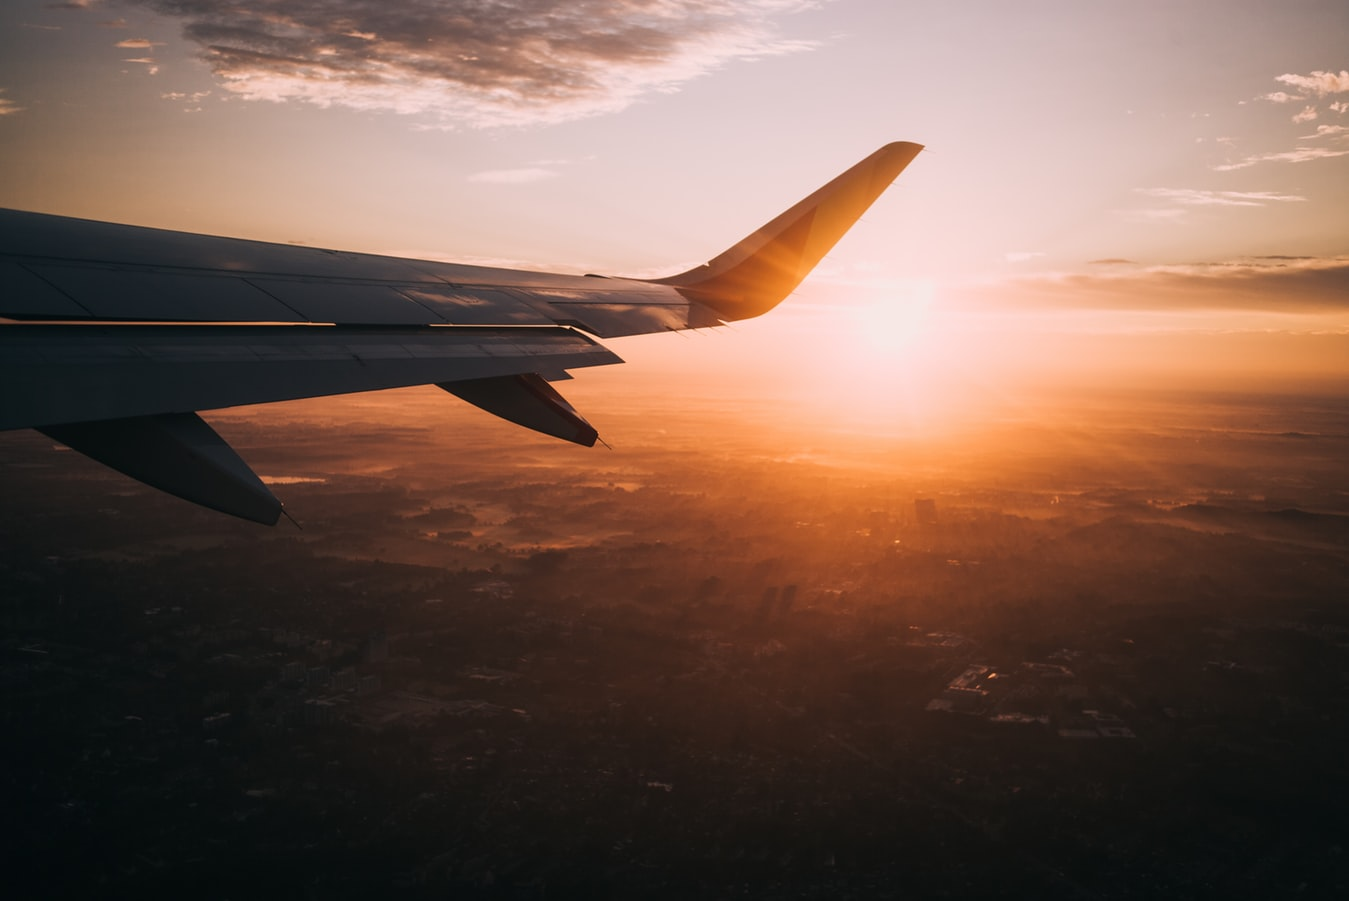 BTW op vliegtickets